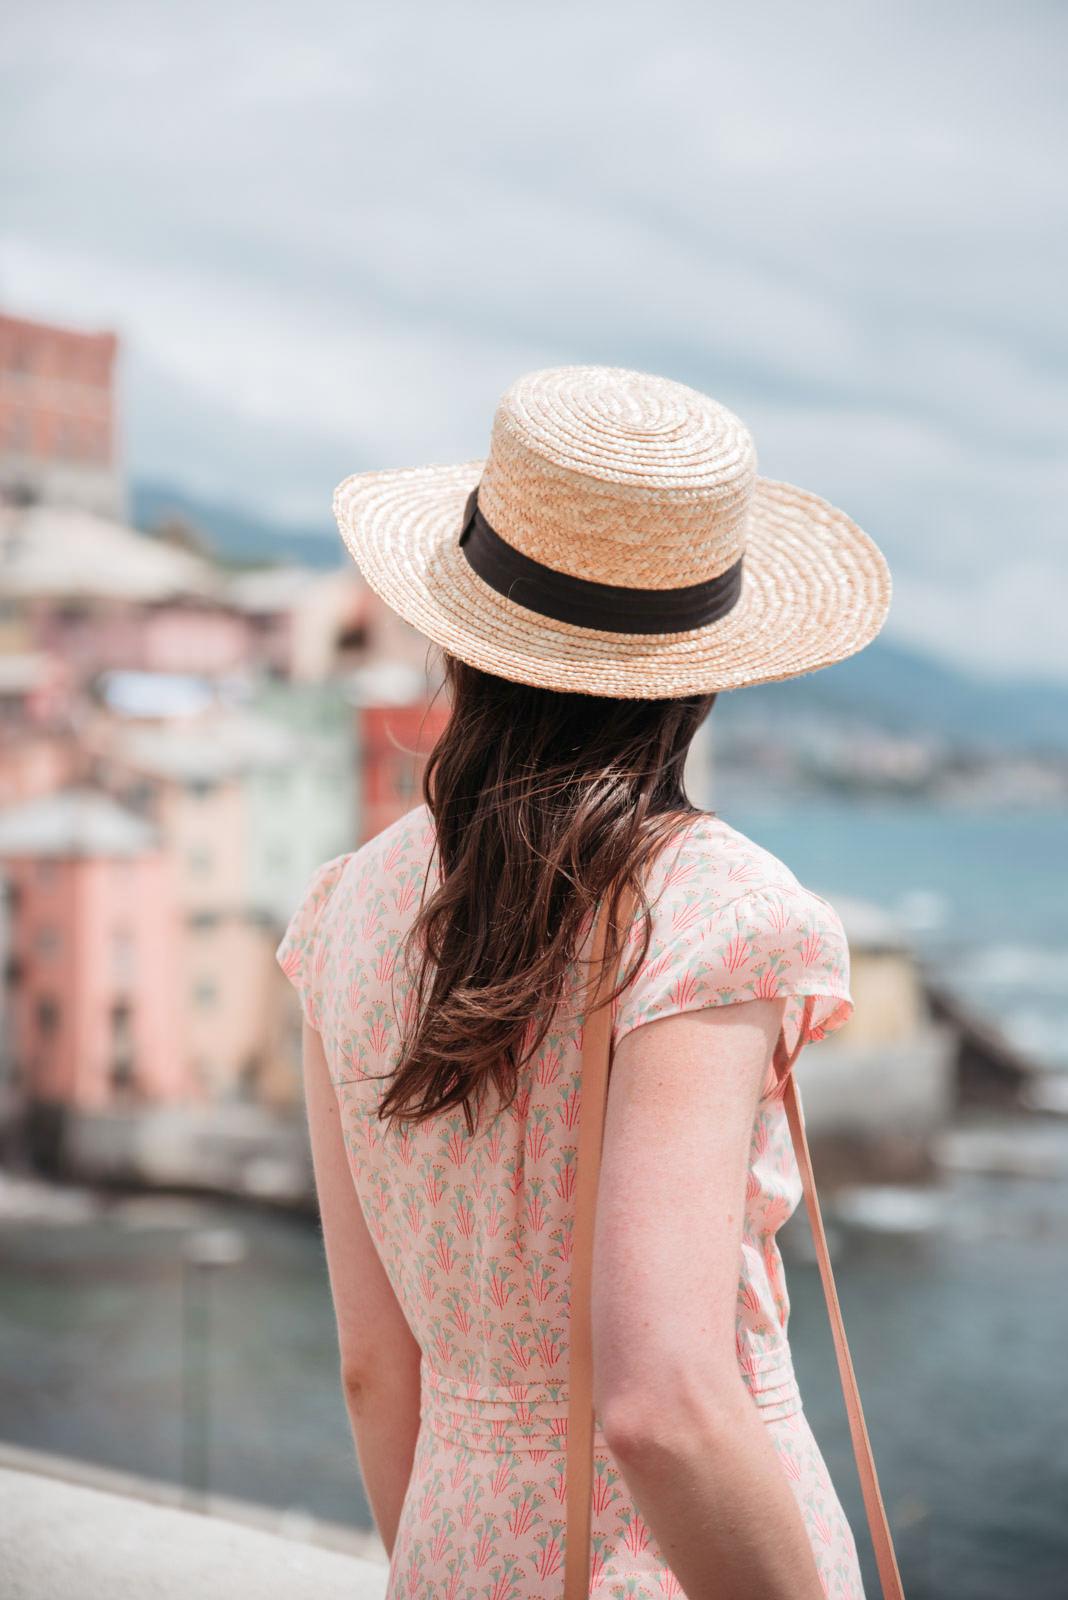 Blog-Mode-And-The-City-Lifestyle-Italie-Bocadasse-Camogli-Sestri-Levante-9